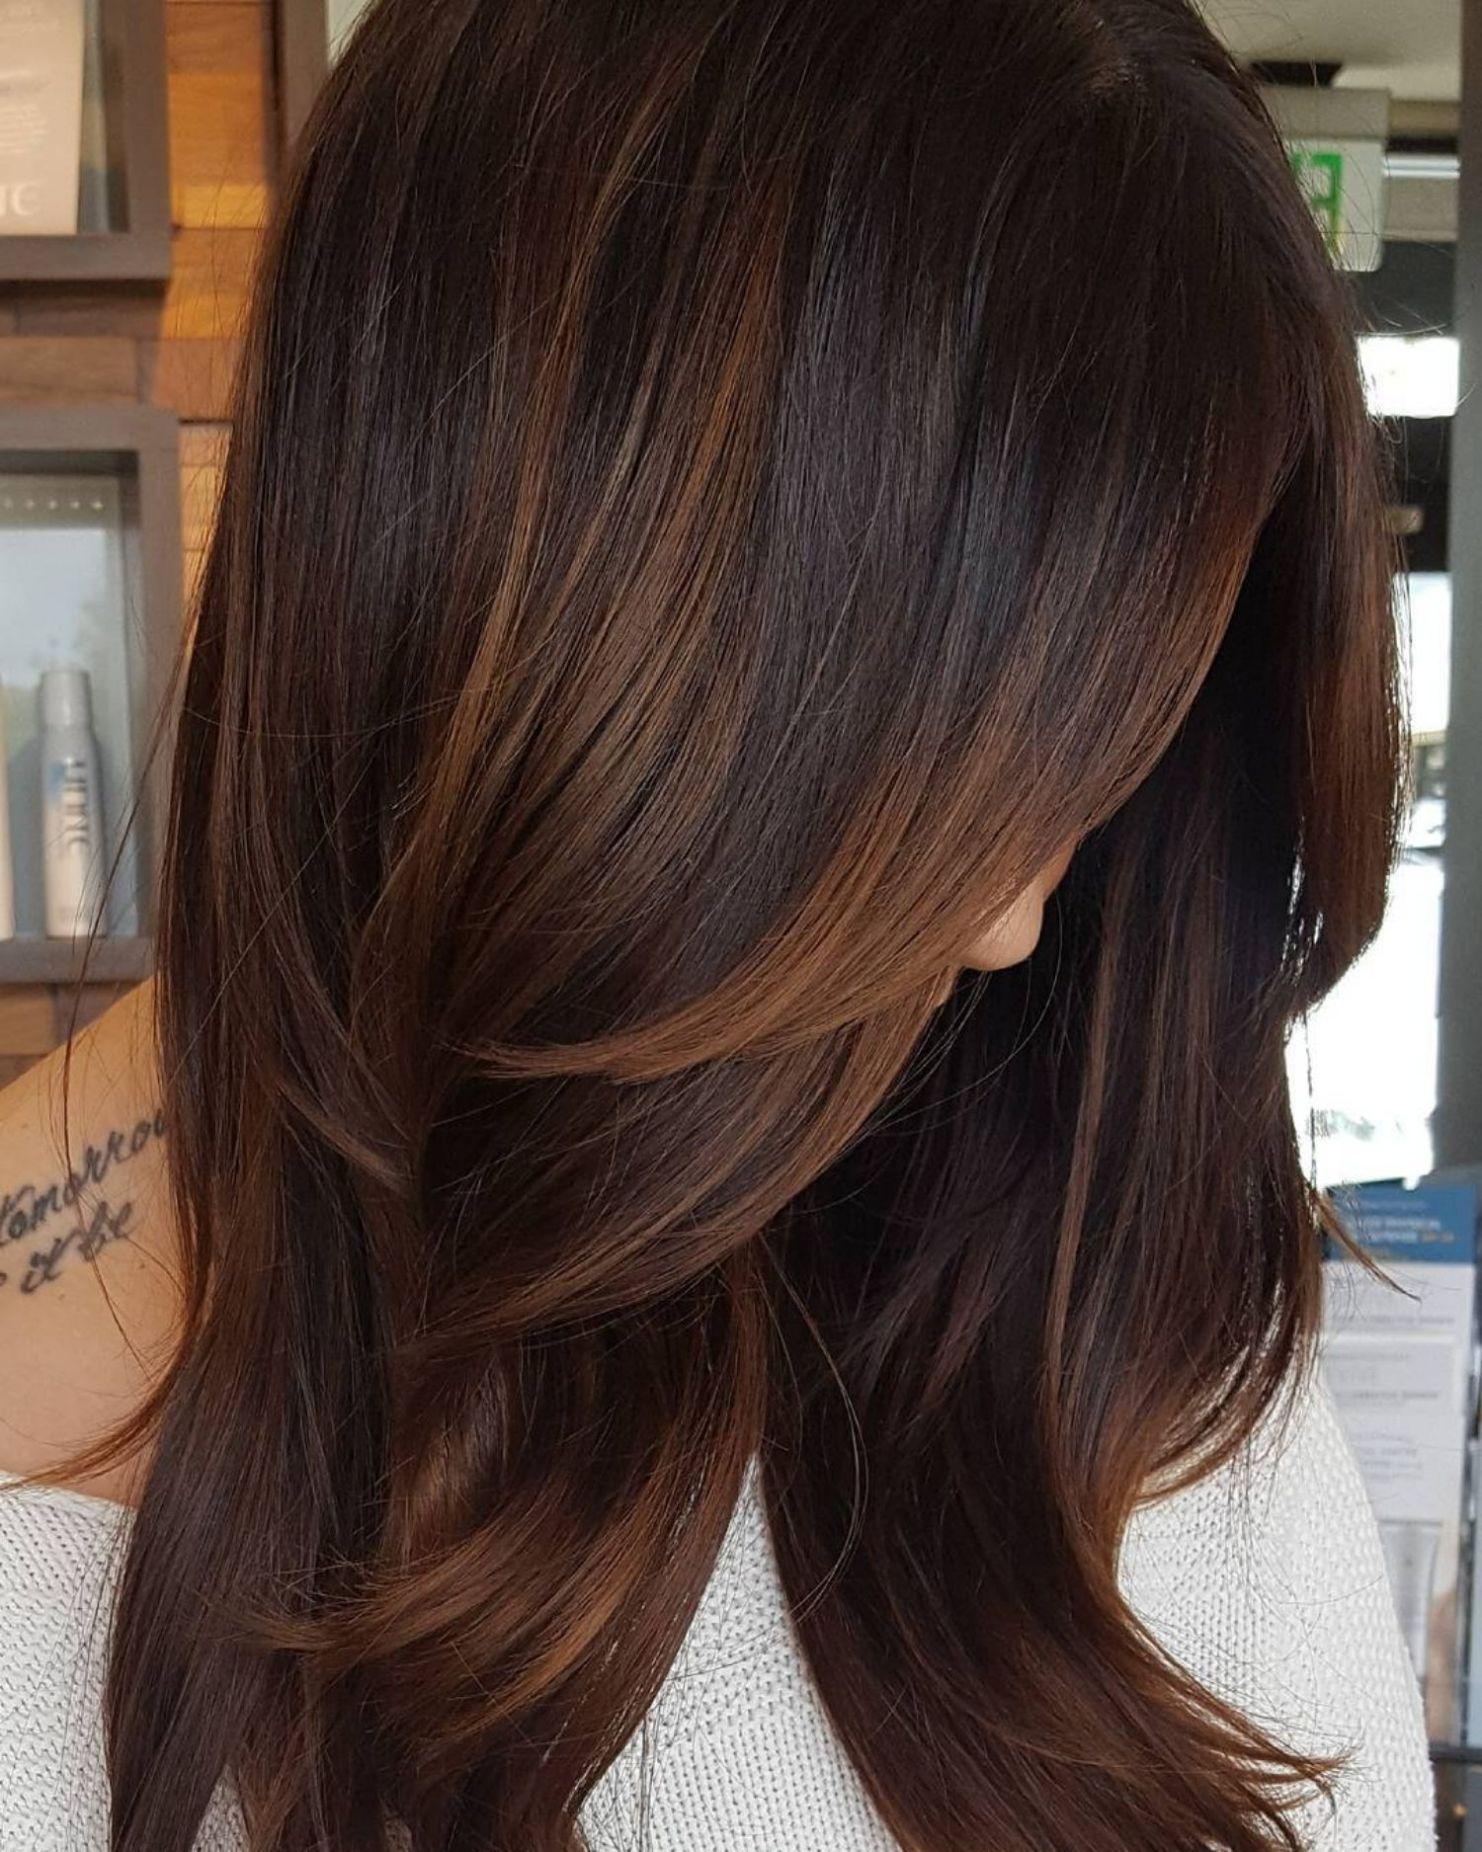 Copper Highlights For Dark Hair Hair Styles Long Hair Styles Hair Highlights